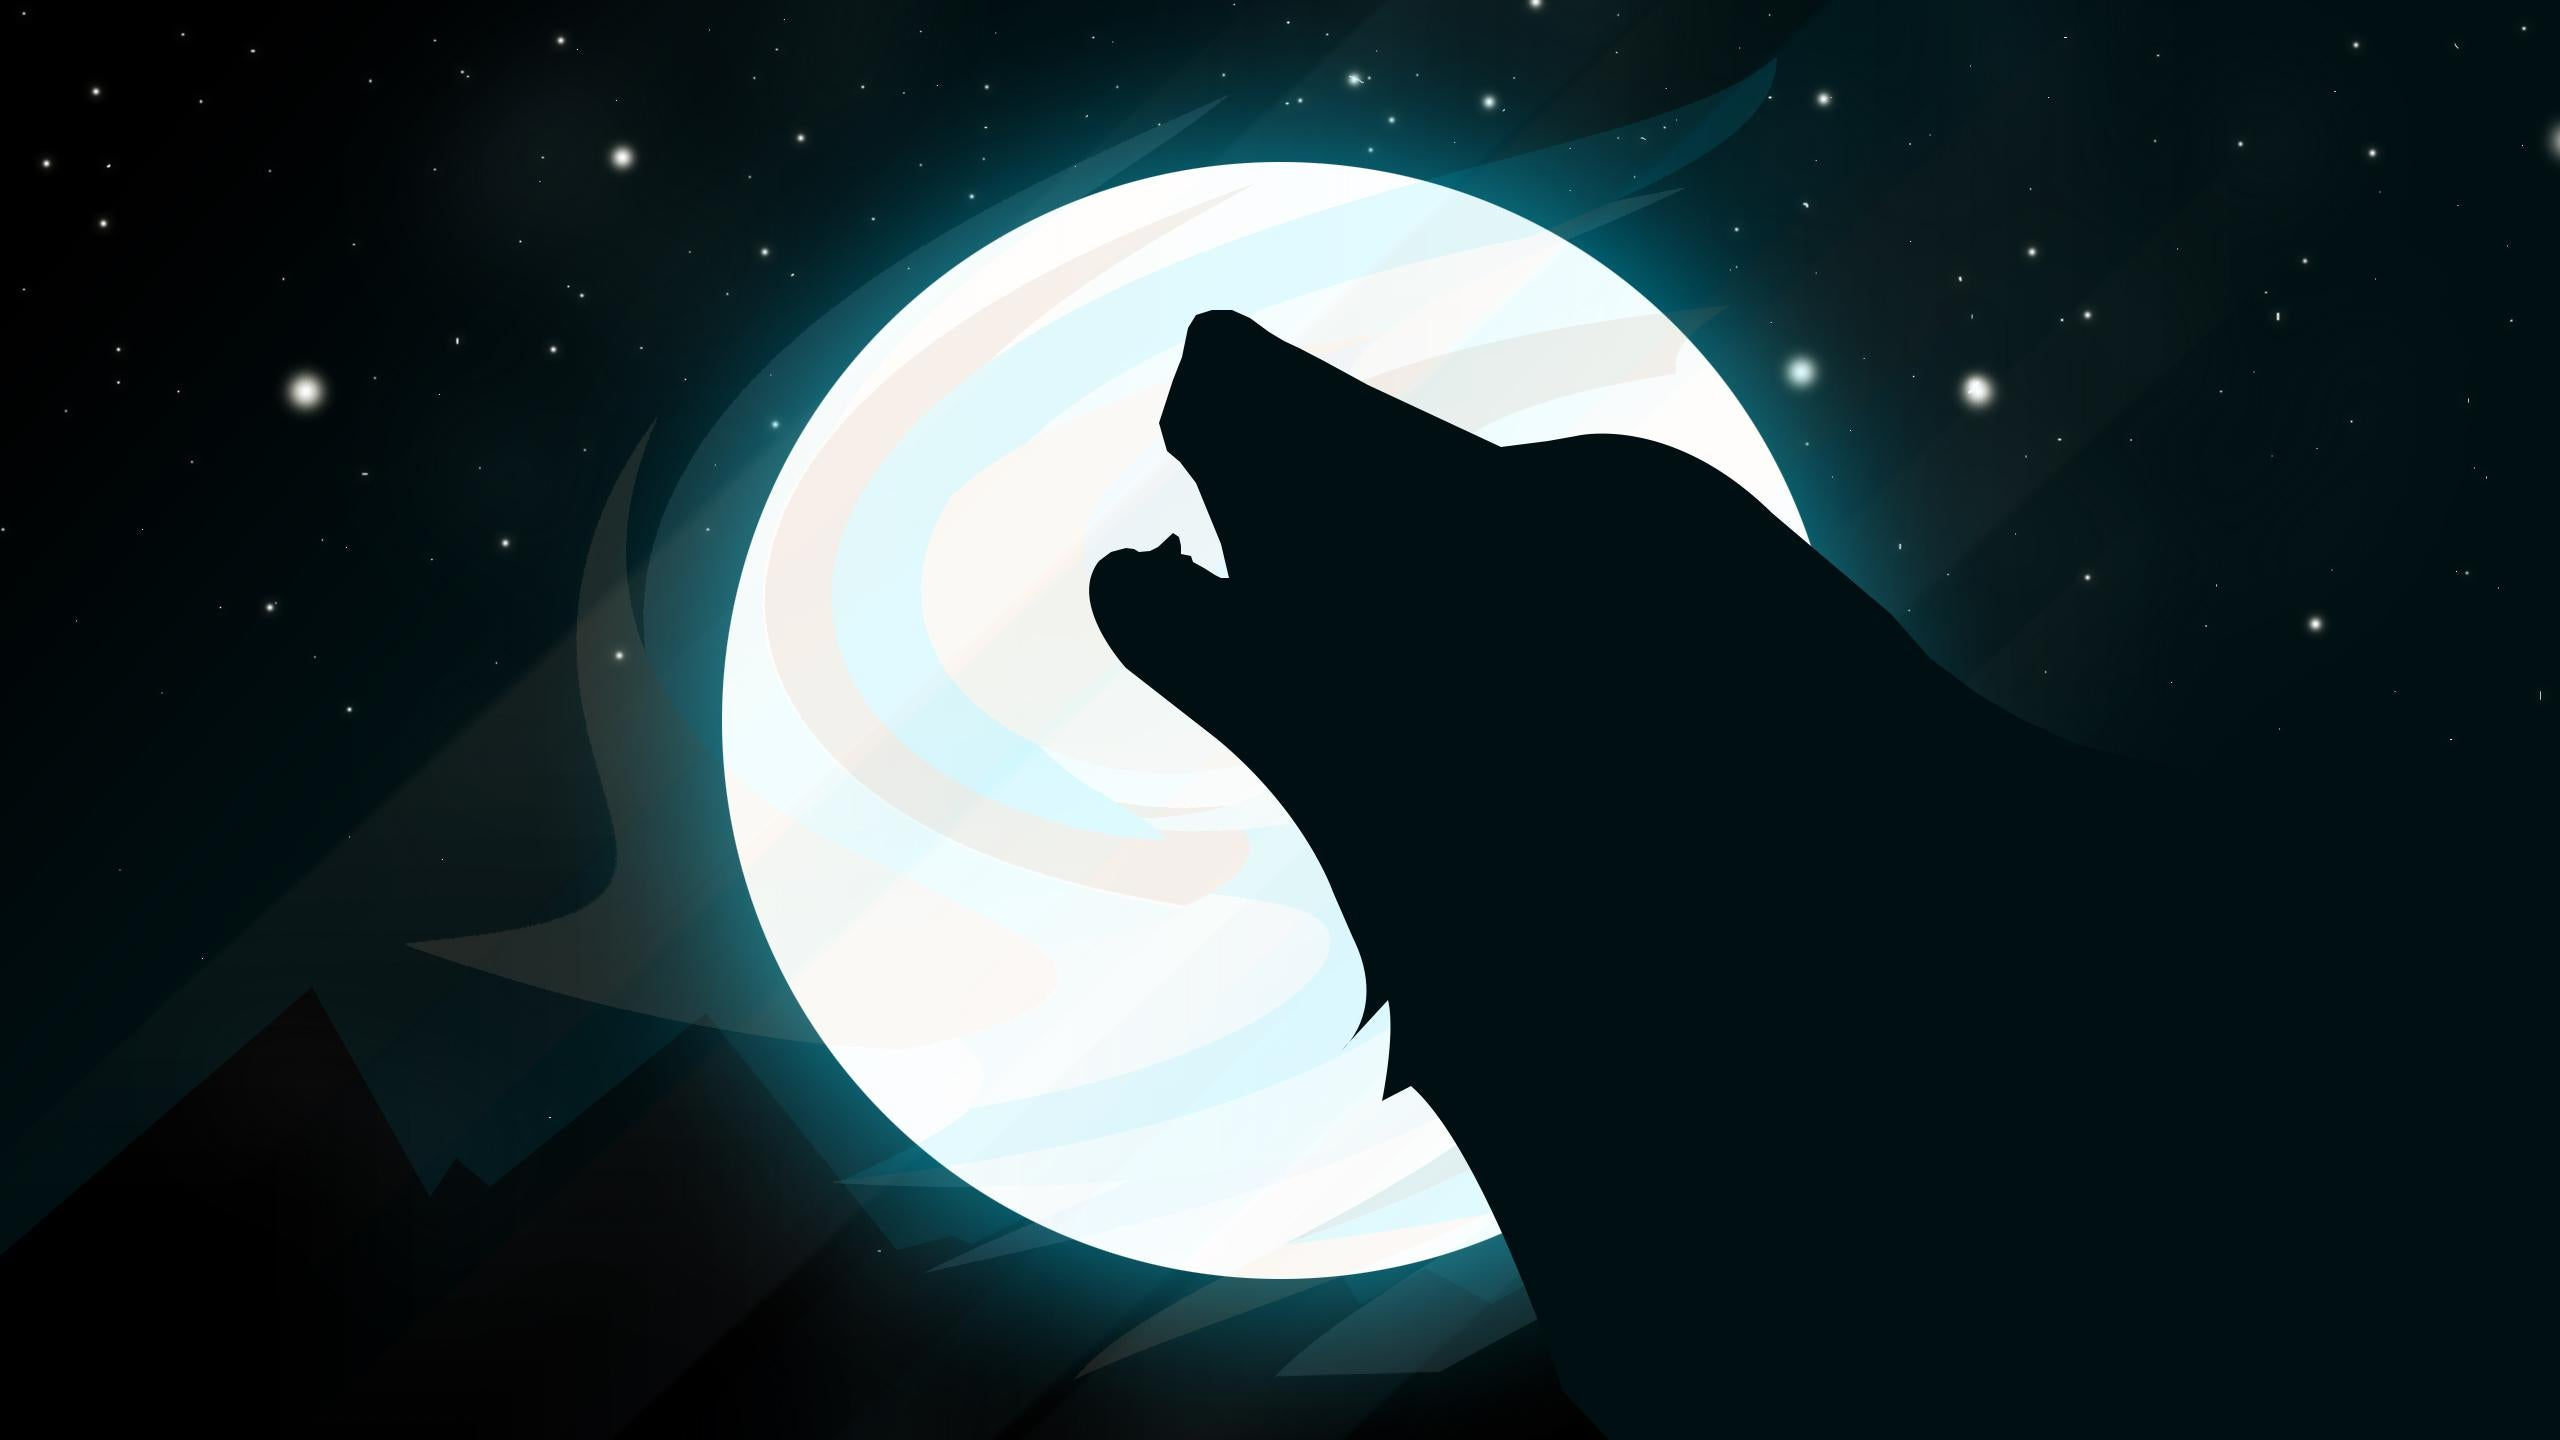 Moon 2303897 Hd Wallpaper Backgrounds Download